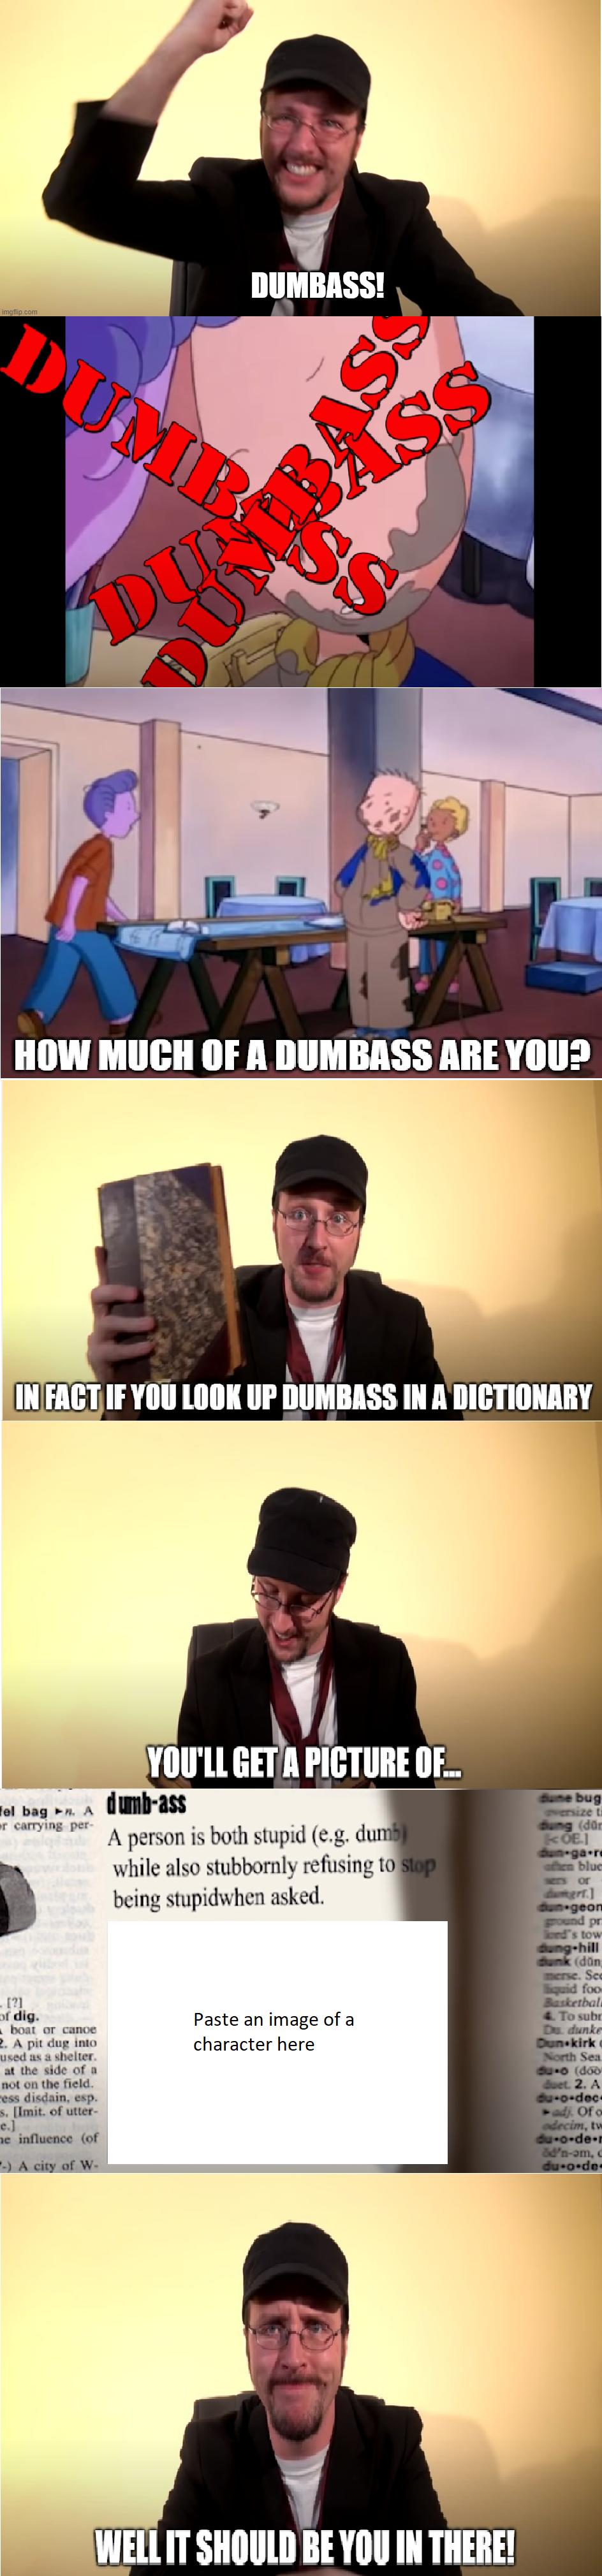 Nostalgia critic dictionary meme (blank)